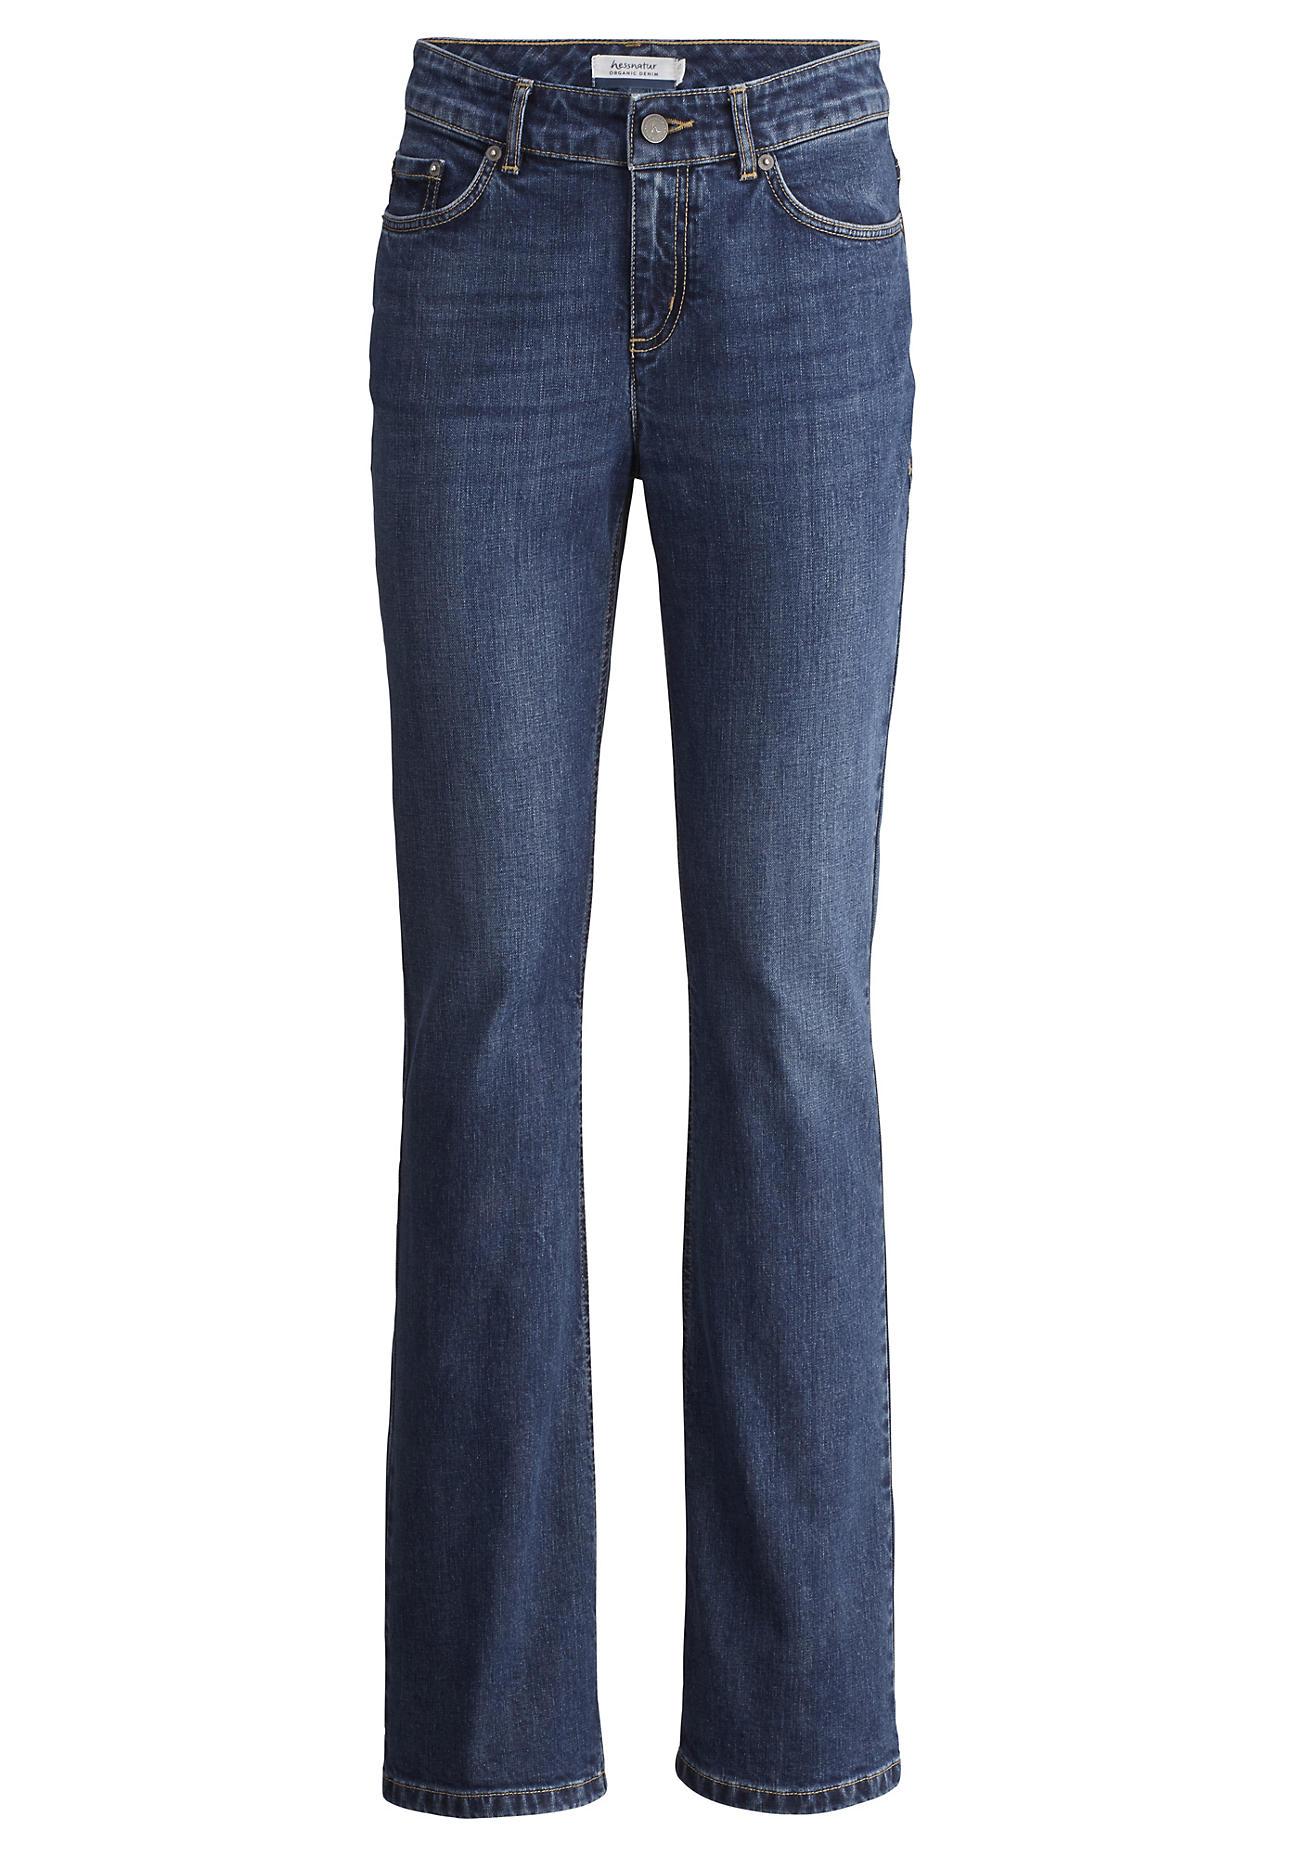 Hosen - hessnatur Damen Jeans Bootcut aus Bio Denim – blau –  - Onlineshop Hessnatur